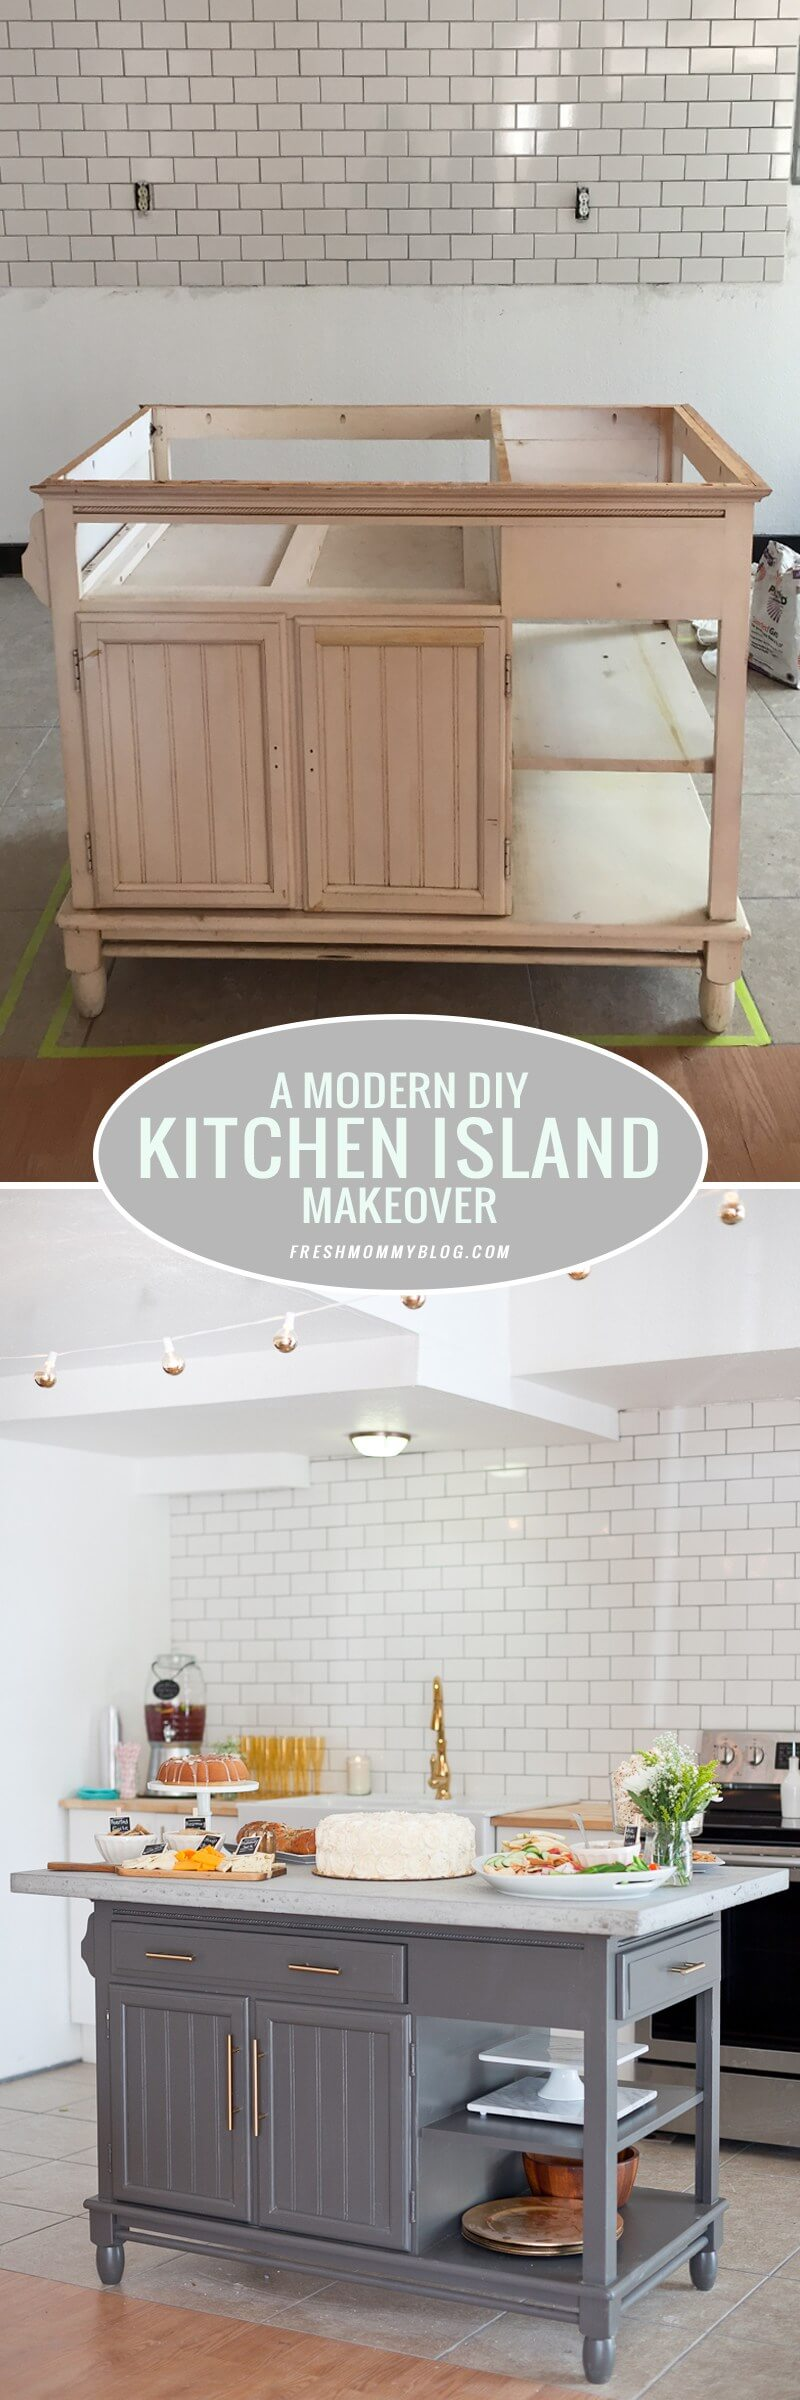 Make a DIY Island that Looks Professional